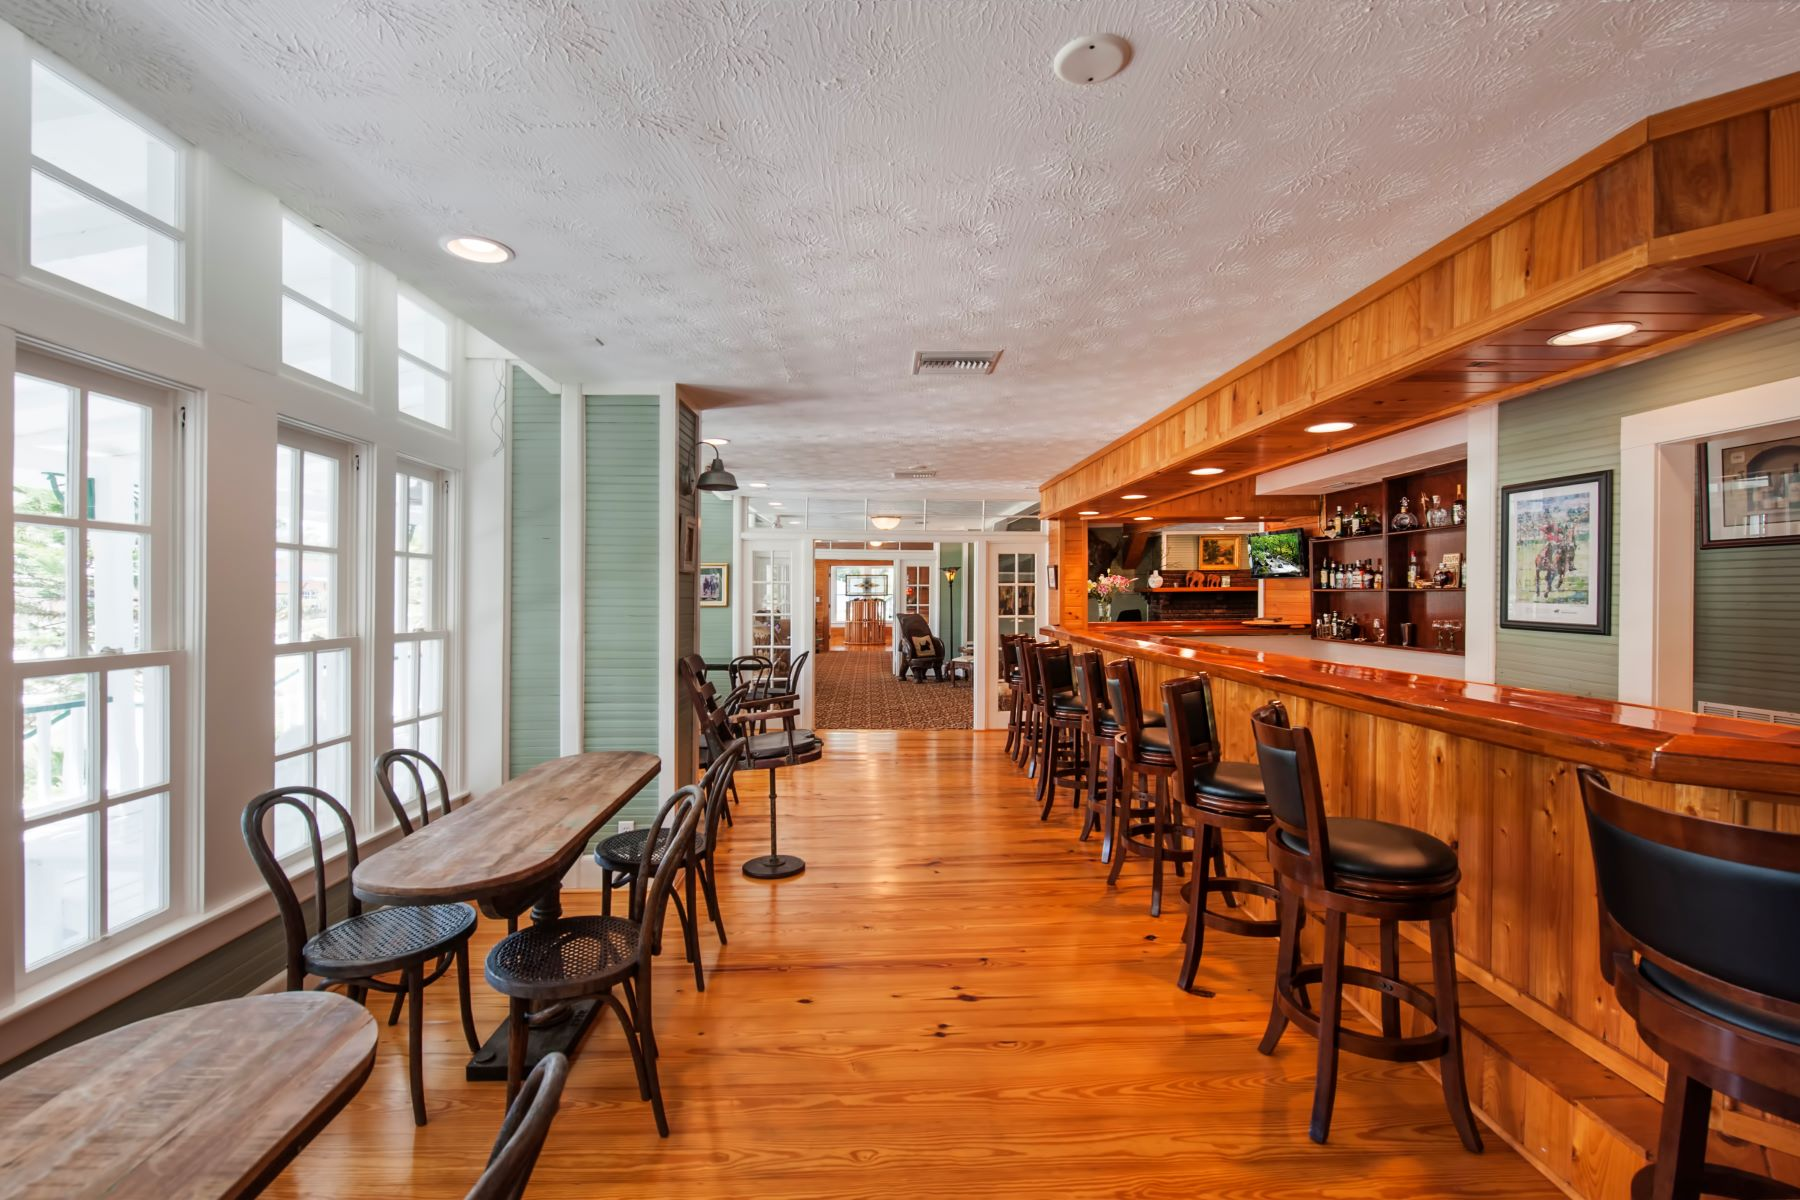 Additional photo for property listing at The Fellsmere Inn 107 N Broadway Street Fellsmere, Florida 32948 Hoa Kỳ